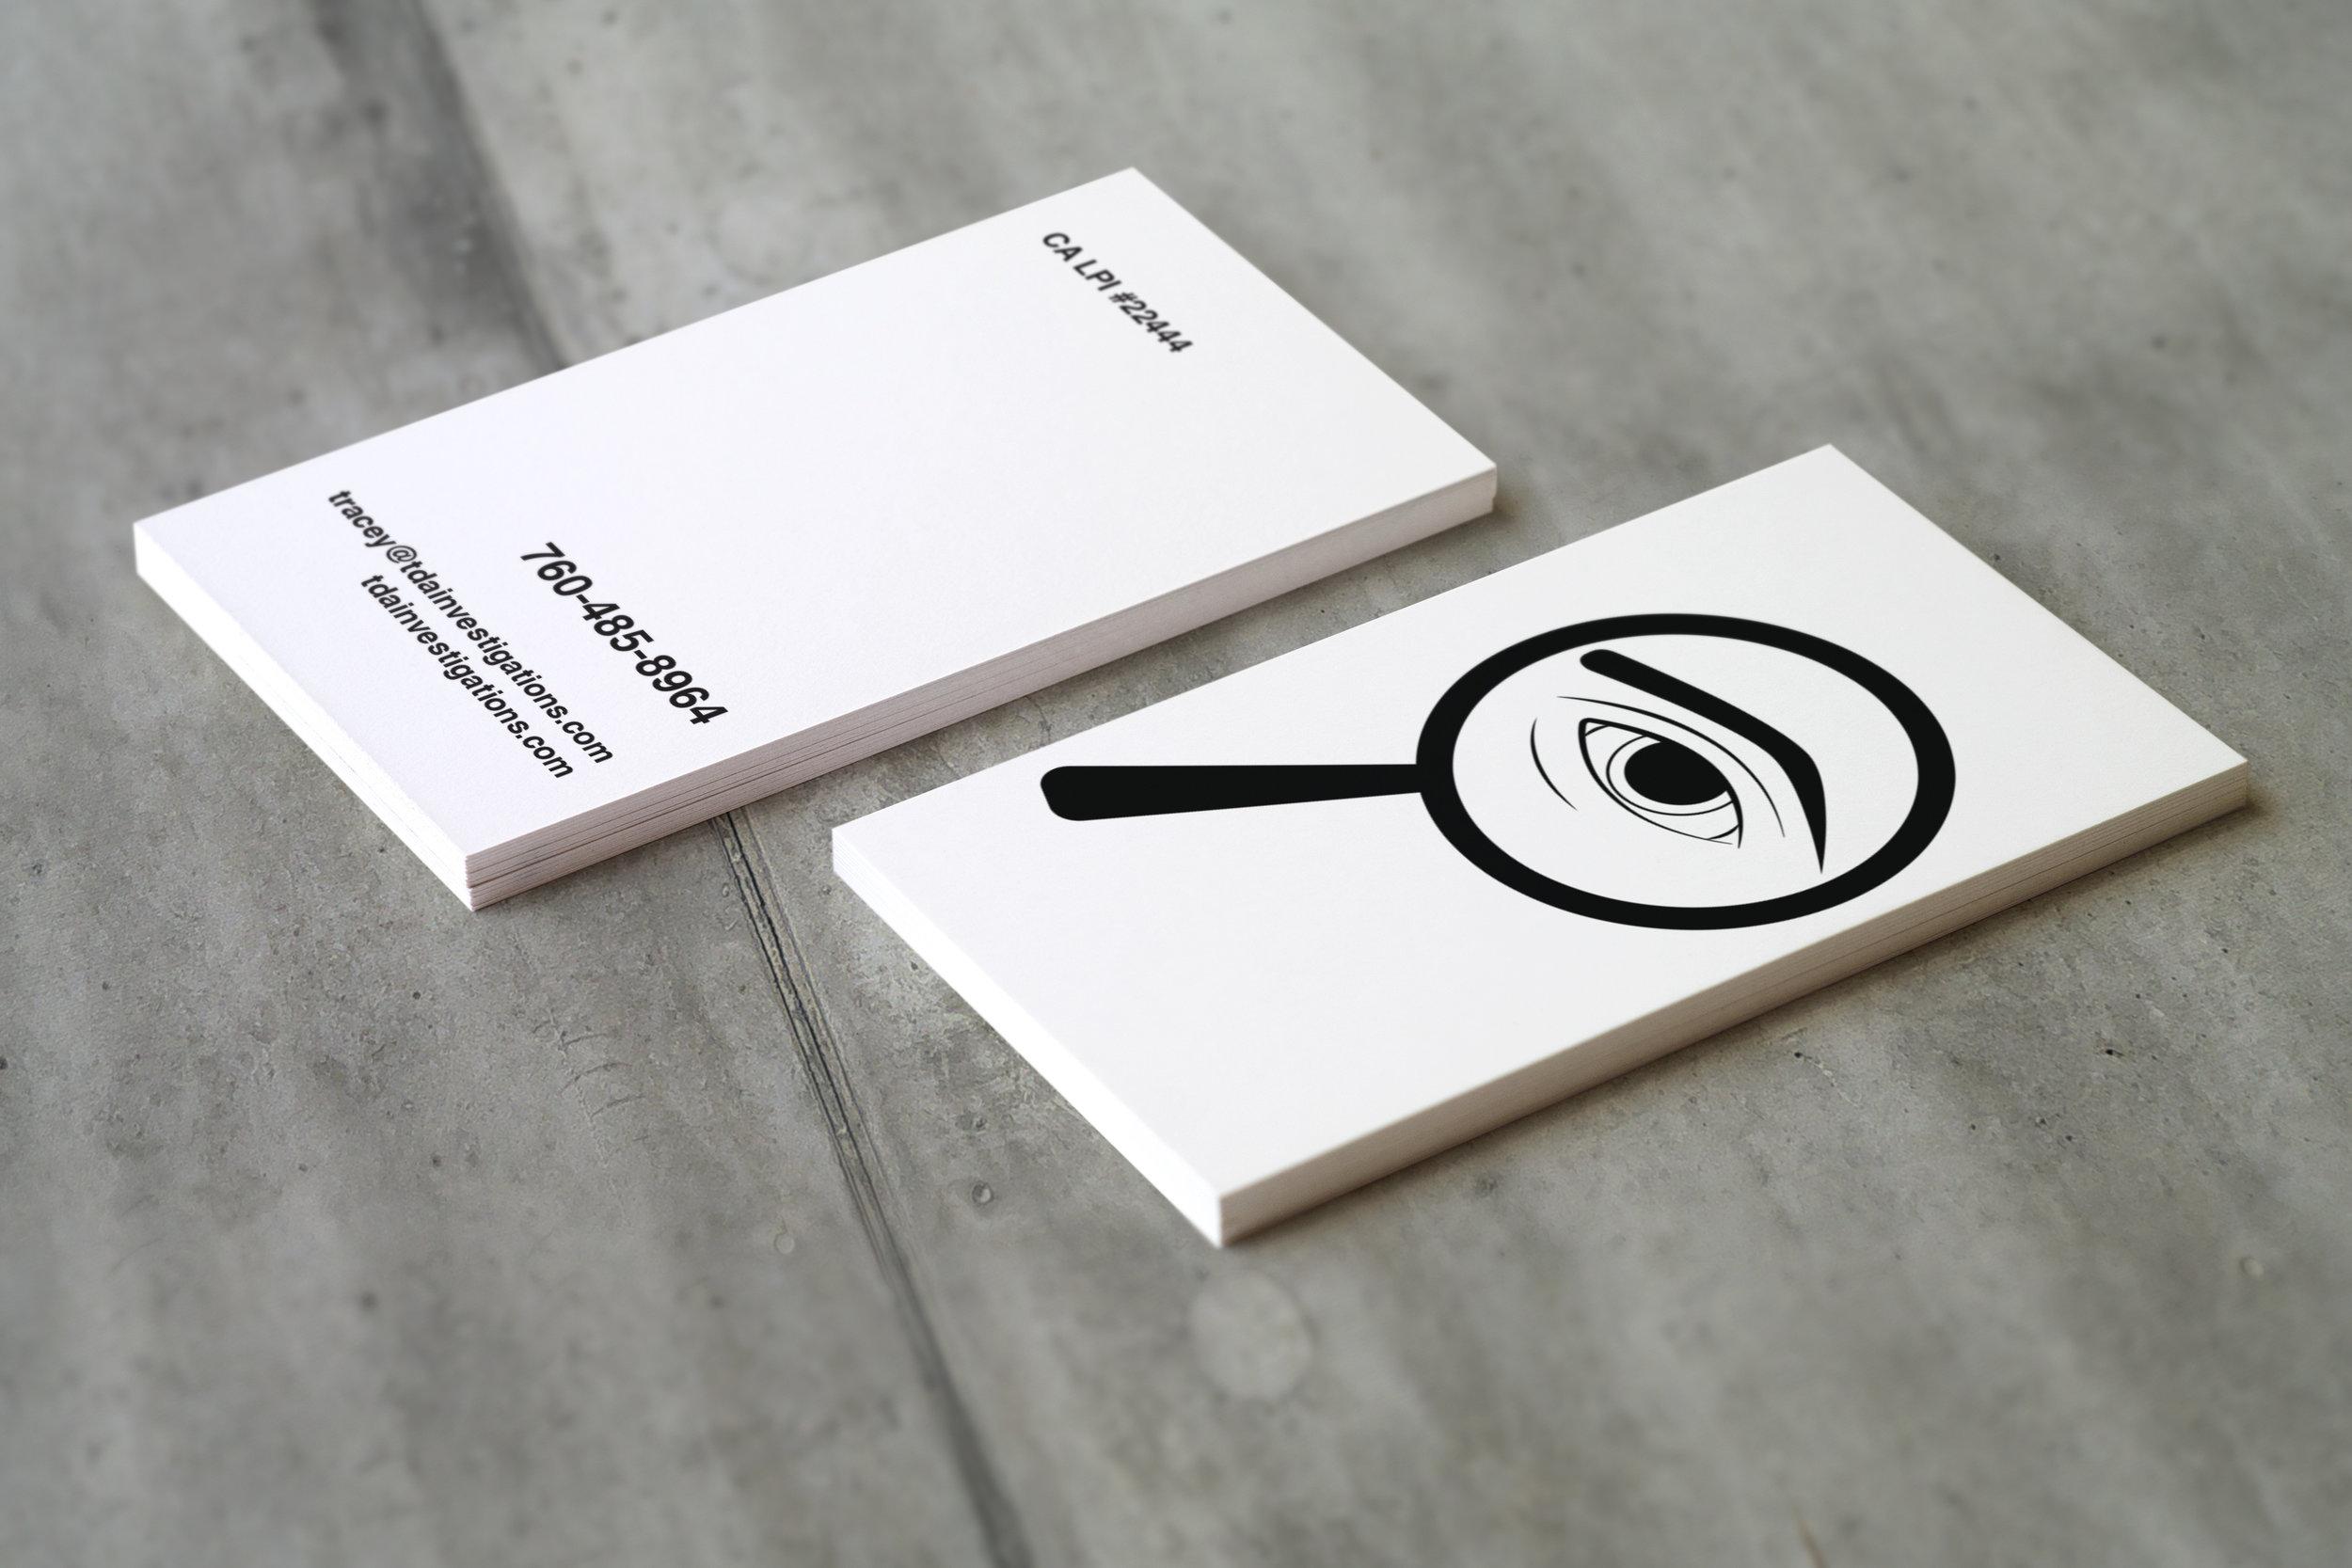 tda business card mockup.jpg